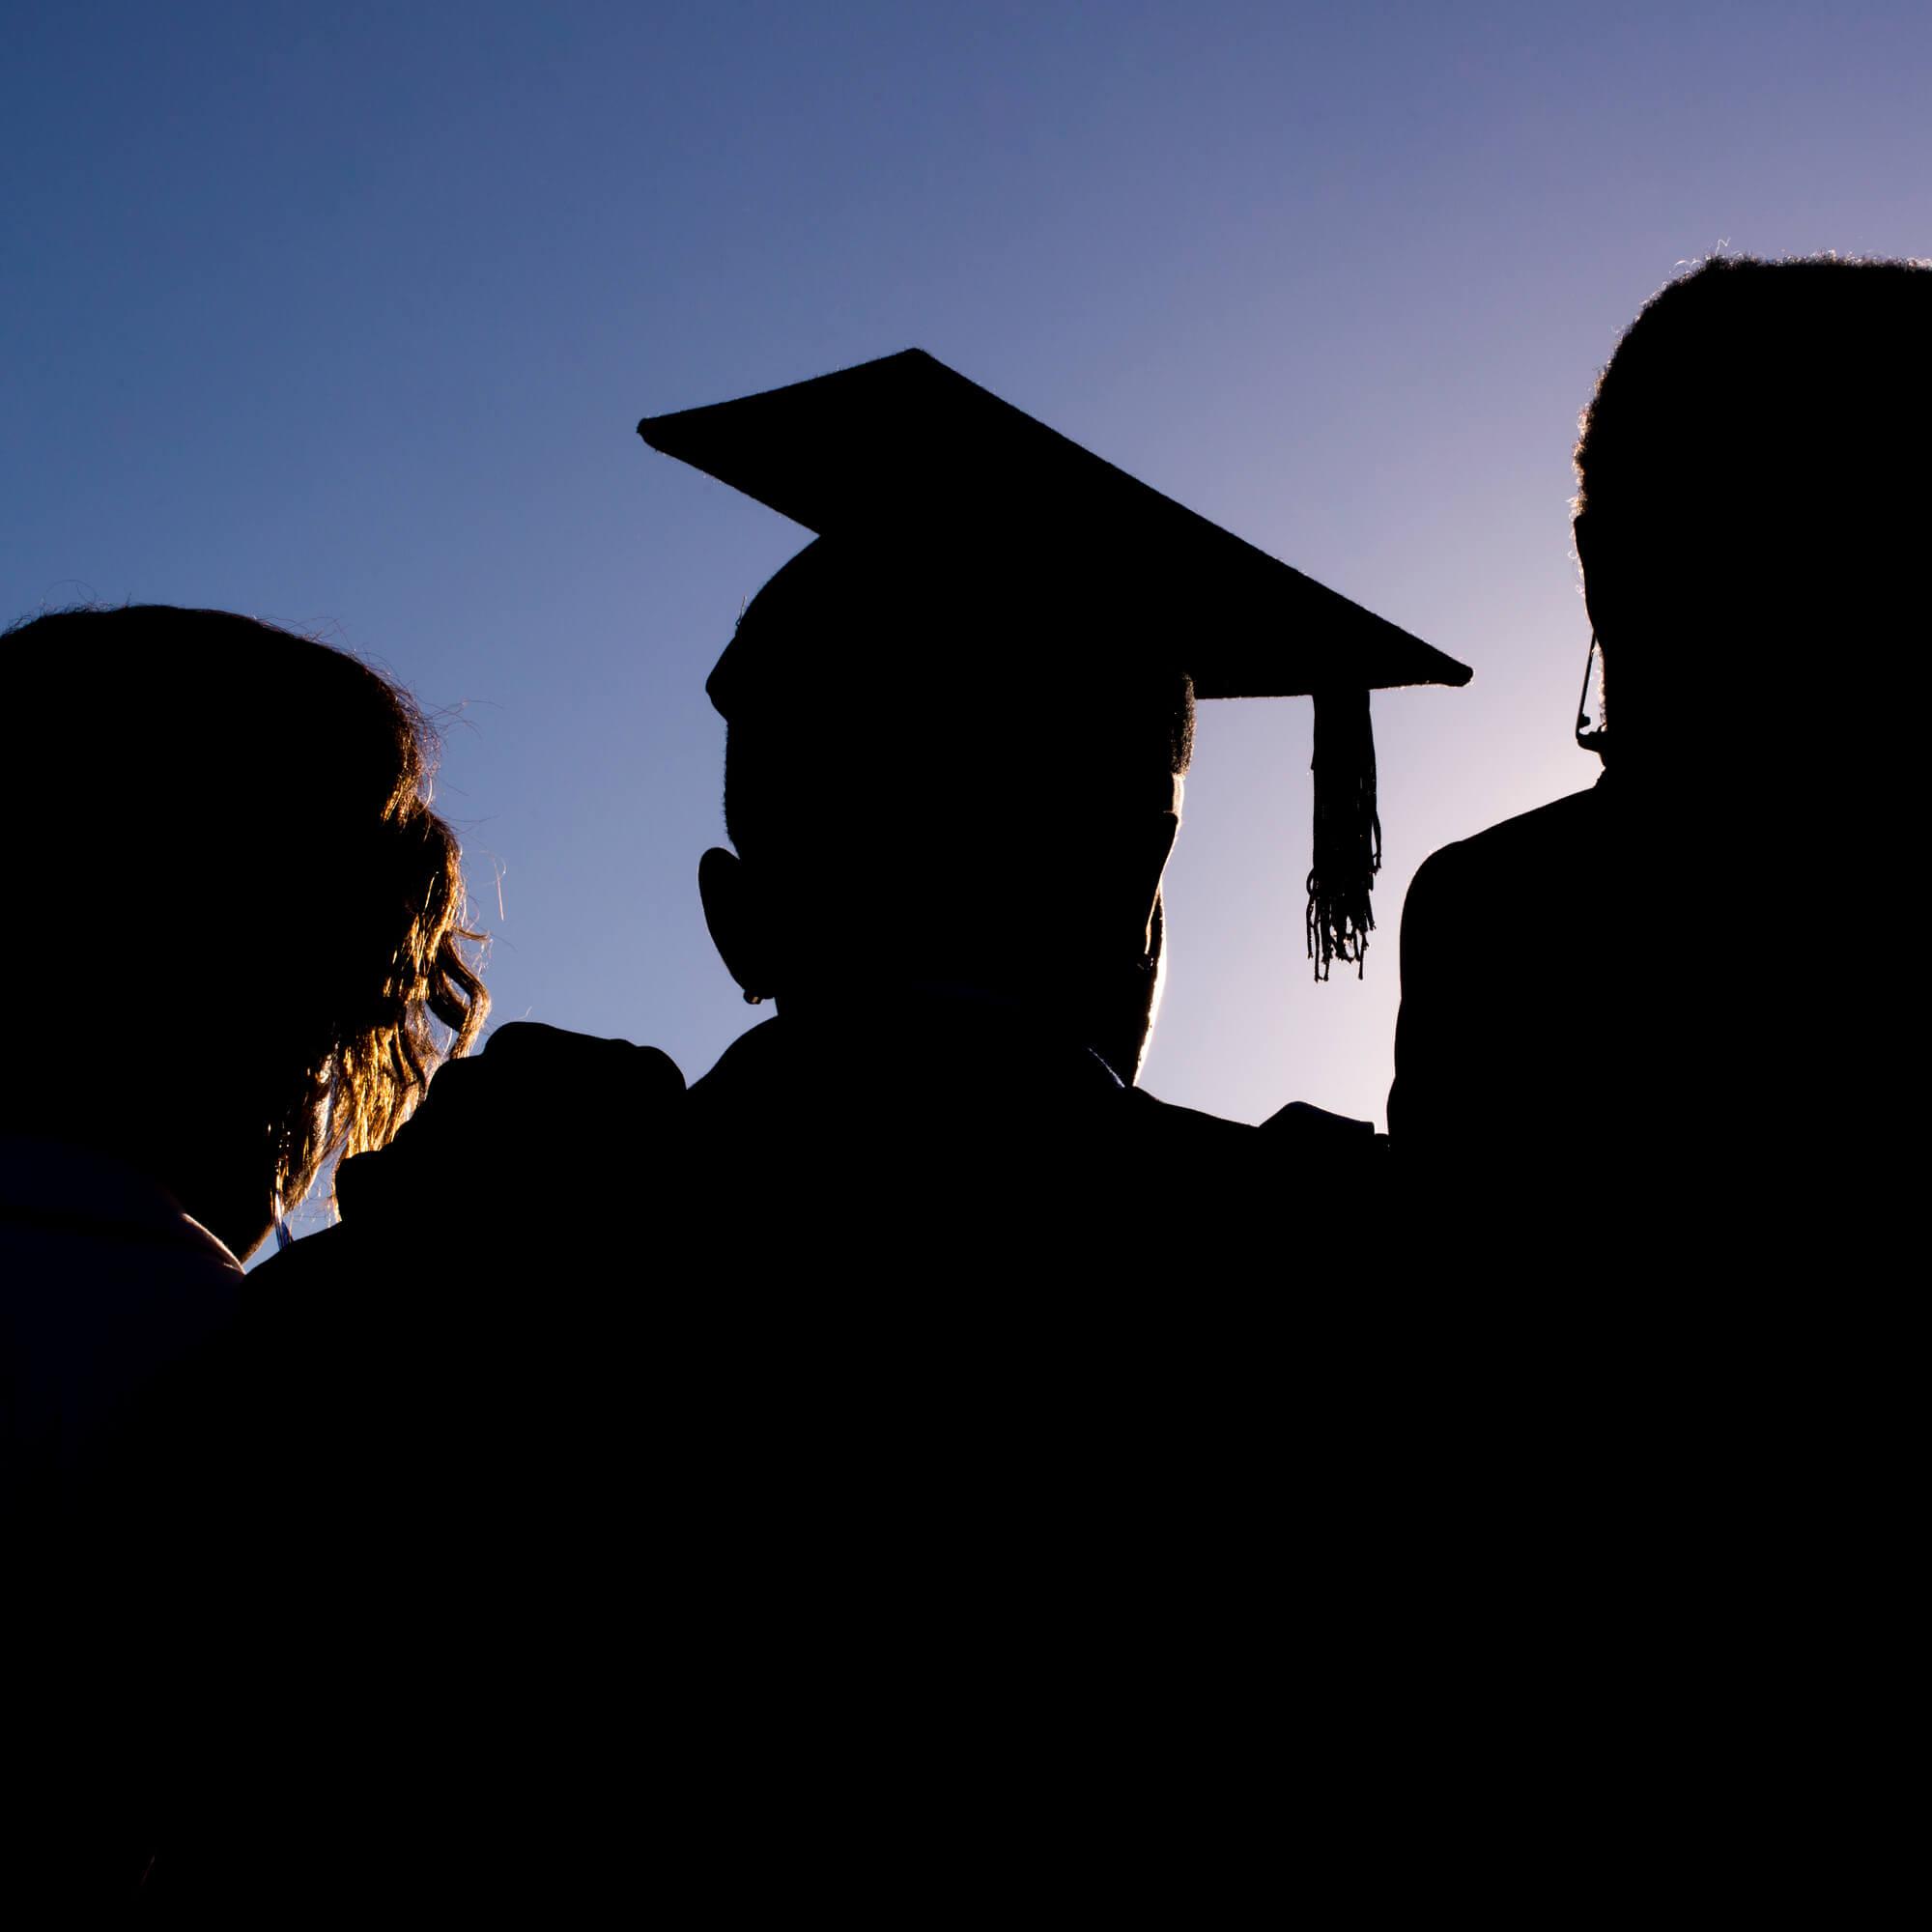 A silhouette of a graduate wearing a graduation cap